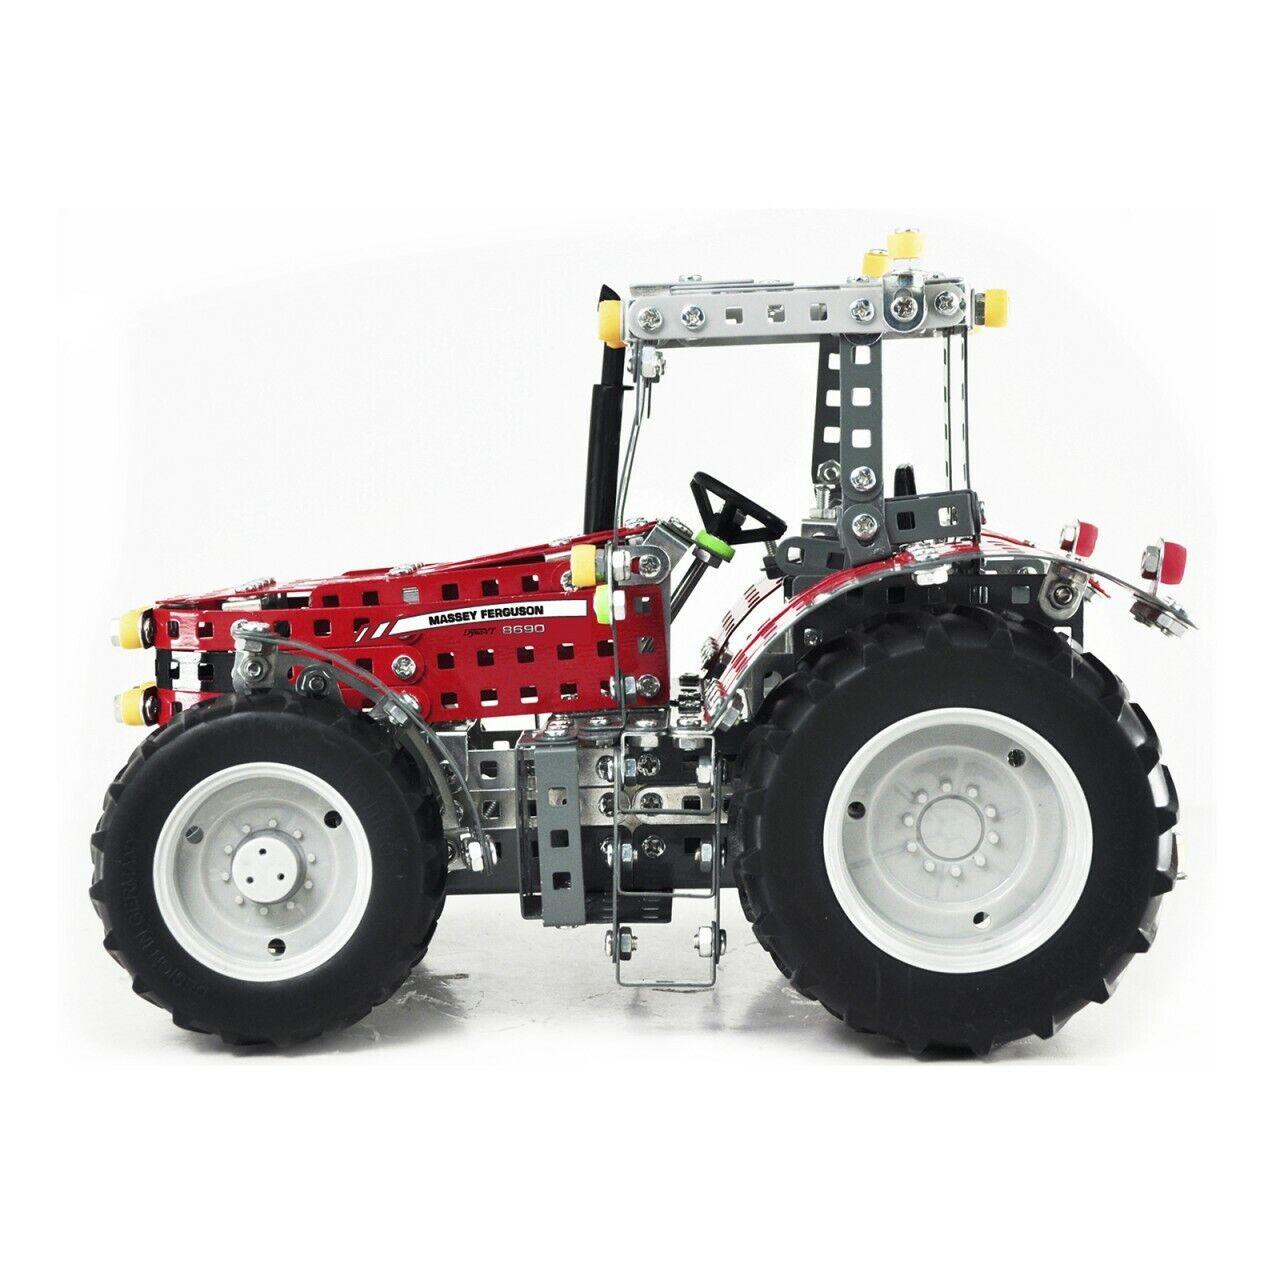 Metallbaukasten Traktor Traktor Traktor Massey Ferguson MF-8690 1024 tlg. von Tronico 271321